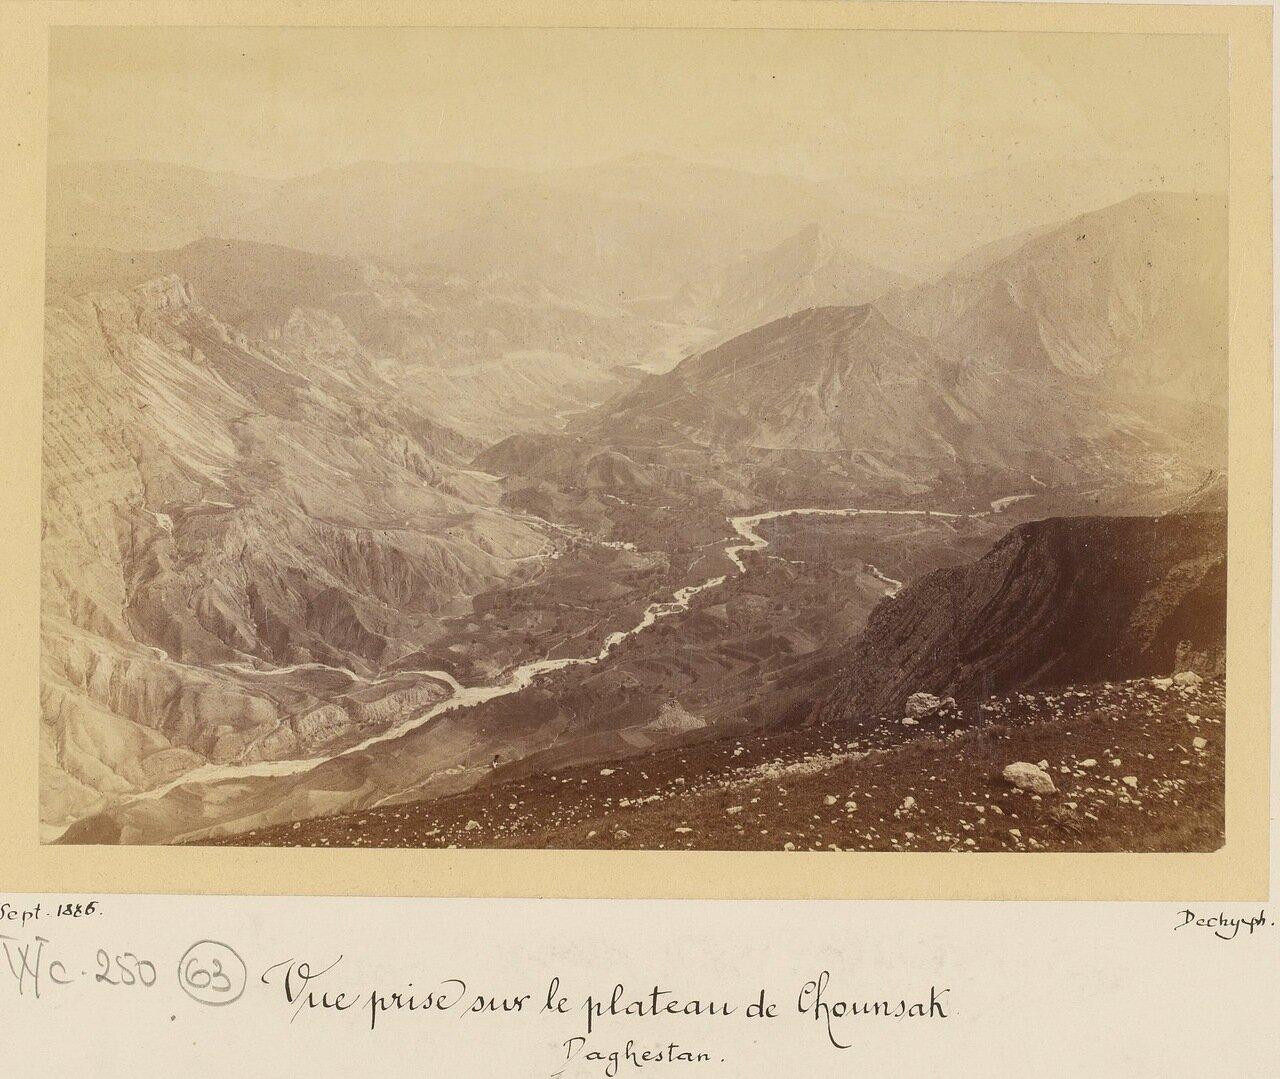 Вид на плато Чунсак, Дагестан